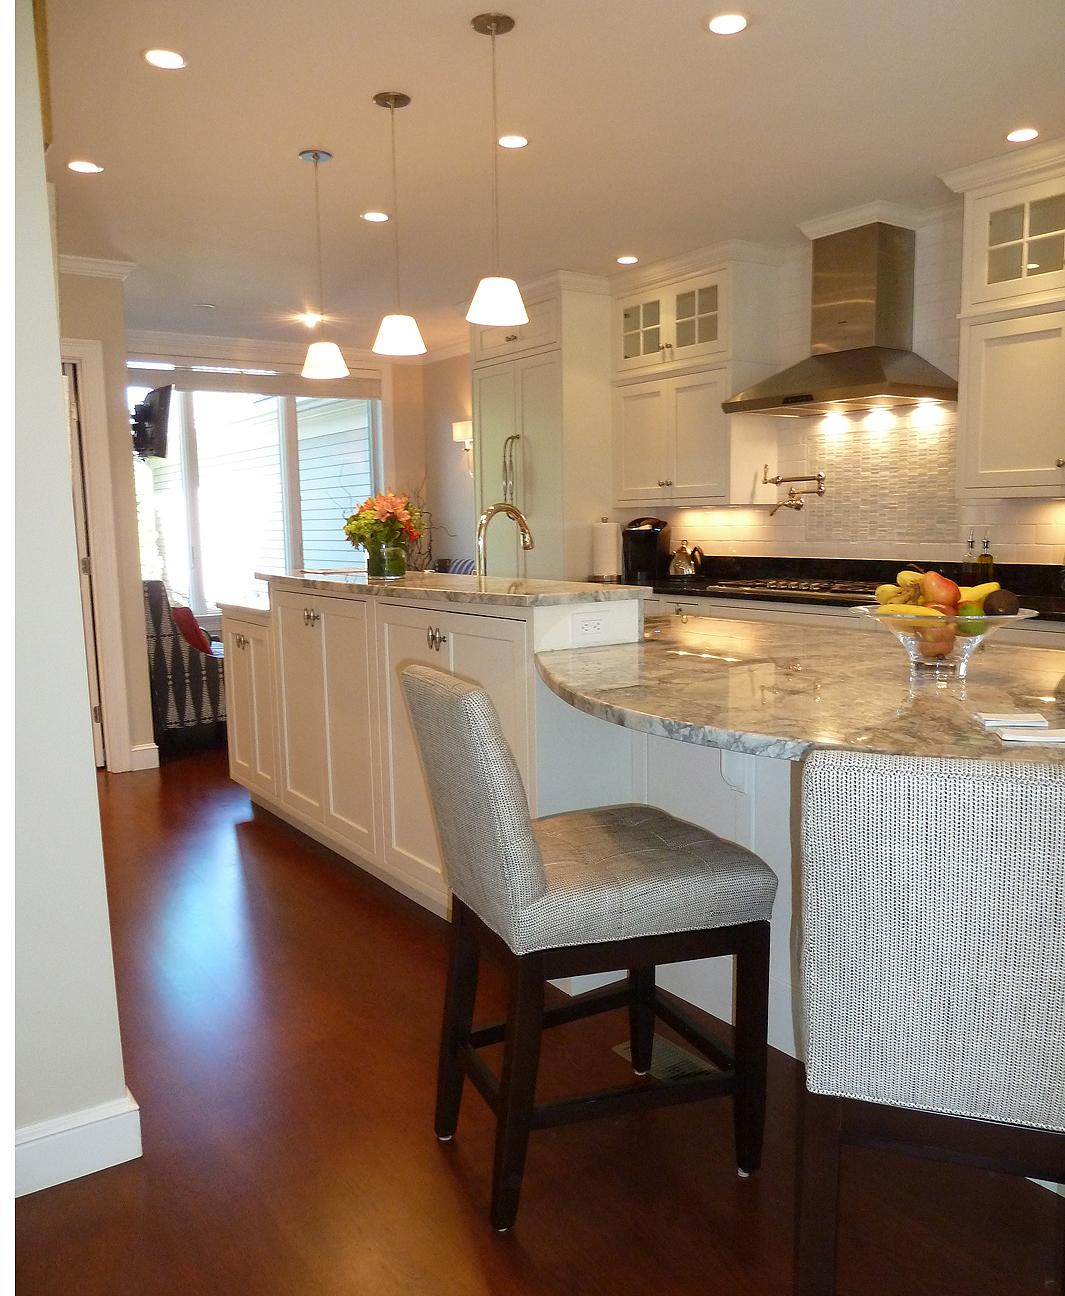 Fullsize Of Modern Kitchen Island Table